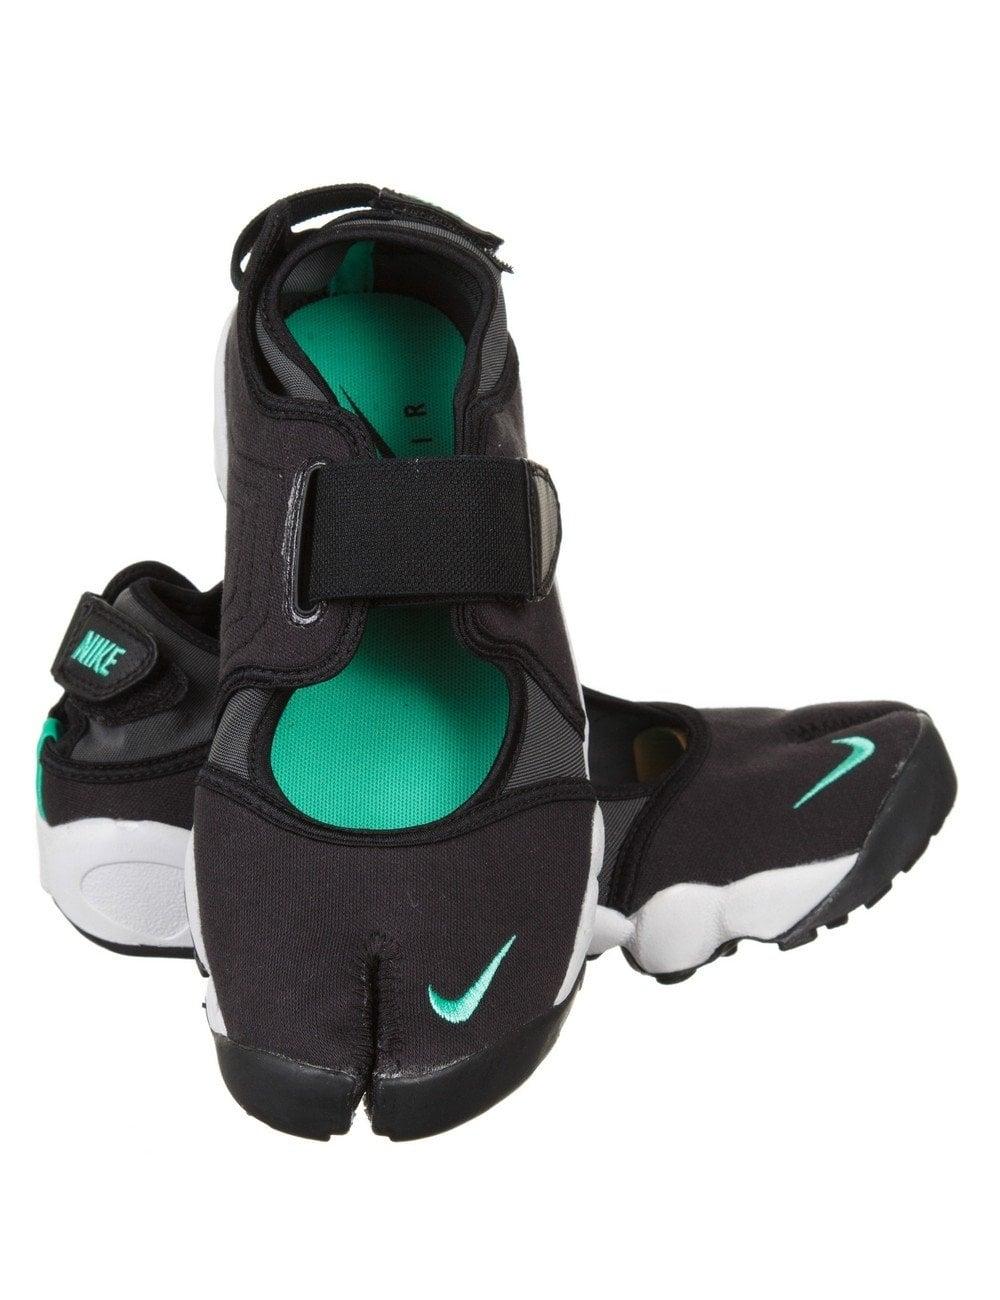 Air Rift Shoes - Black/Menta-Anthracite/Black